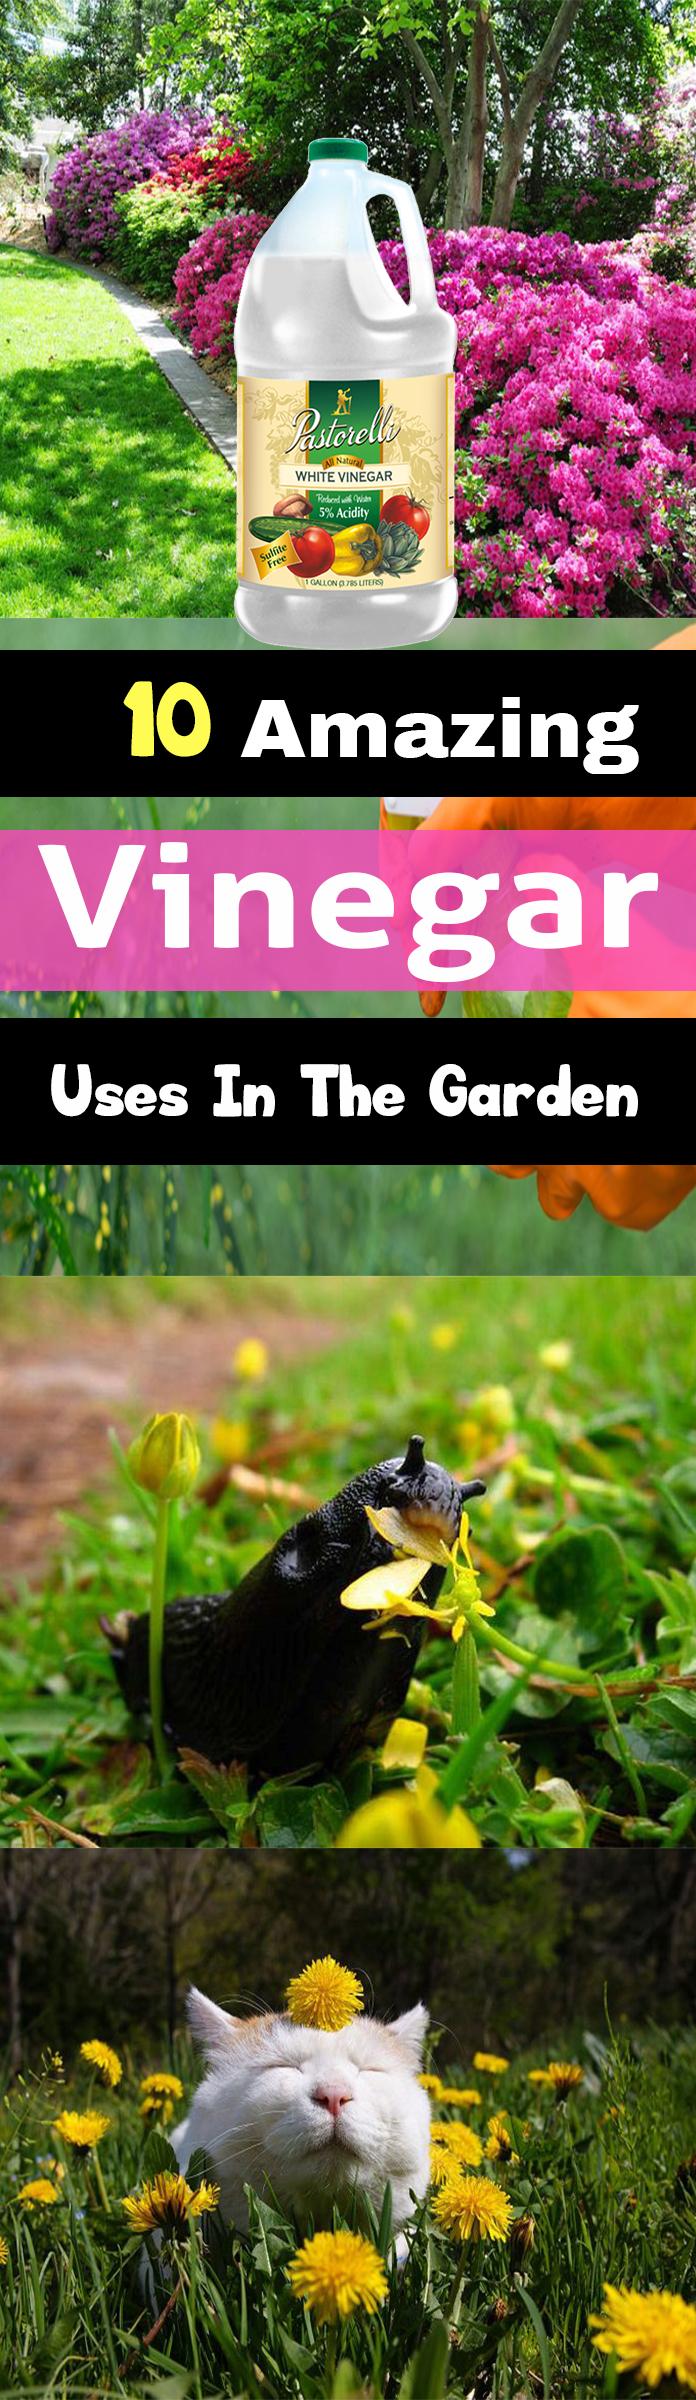 10 Amazing Vinegar Uses In The Garden Organic Gardening